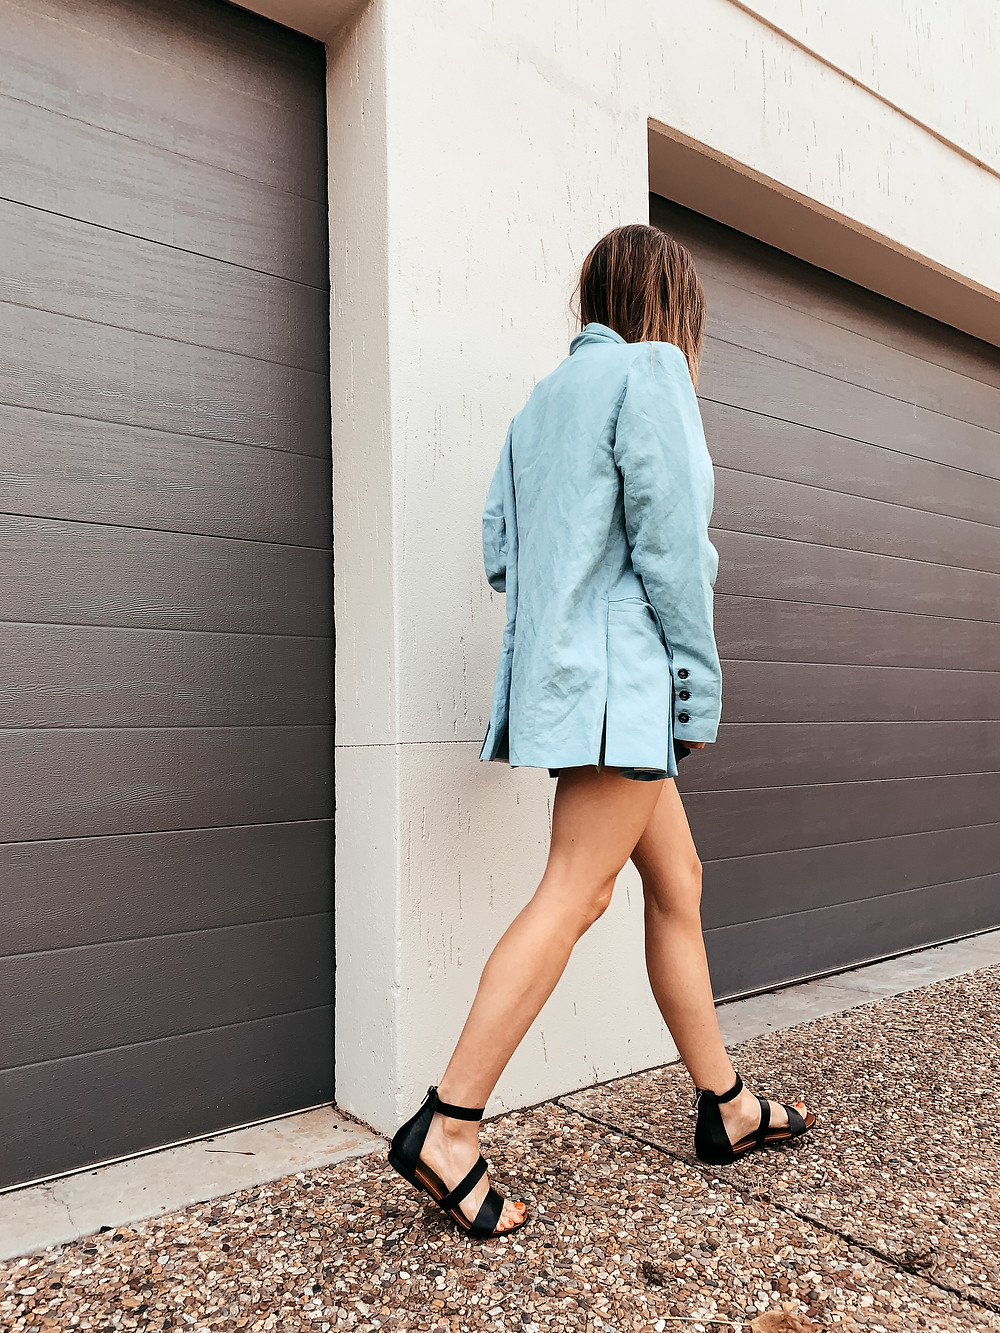 Naturazlier Footwear Street Style